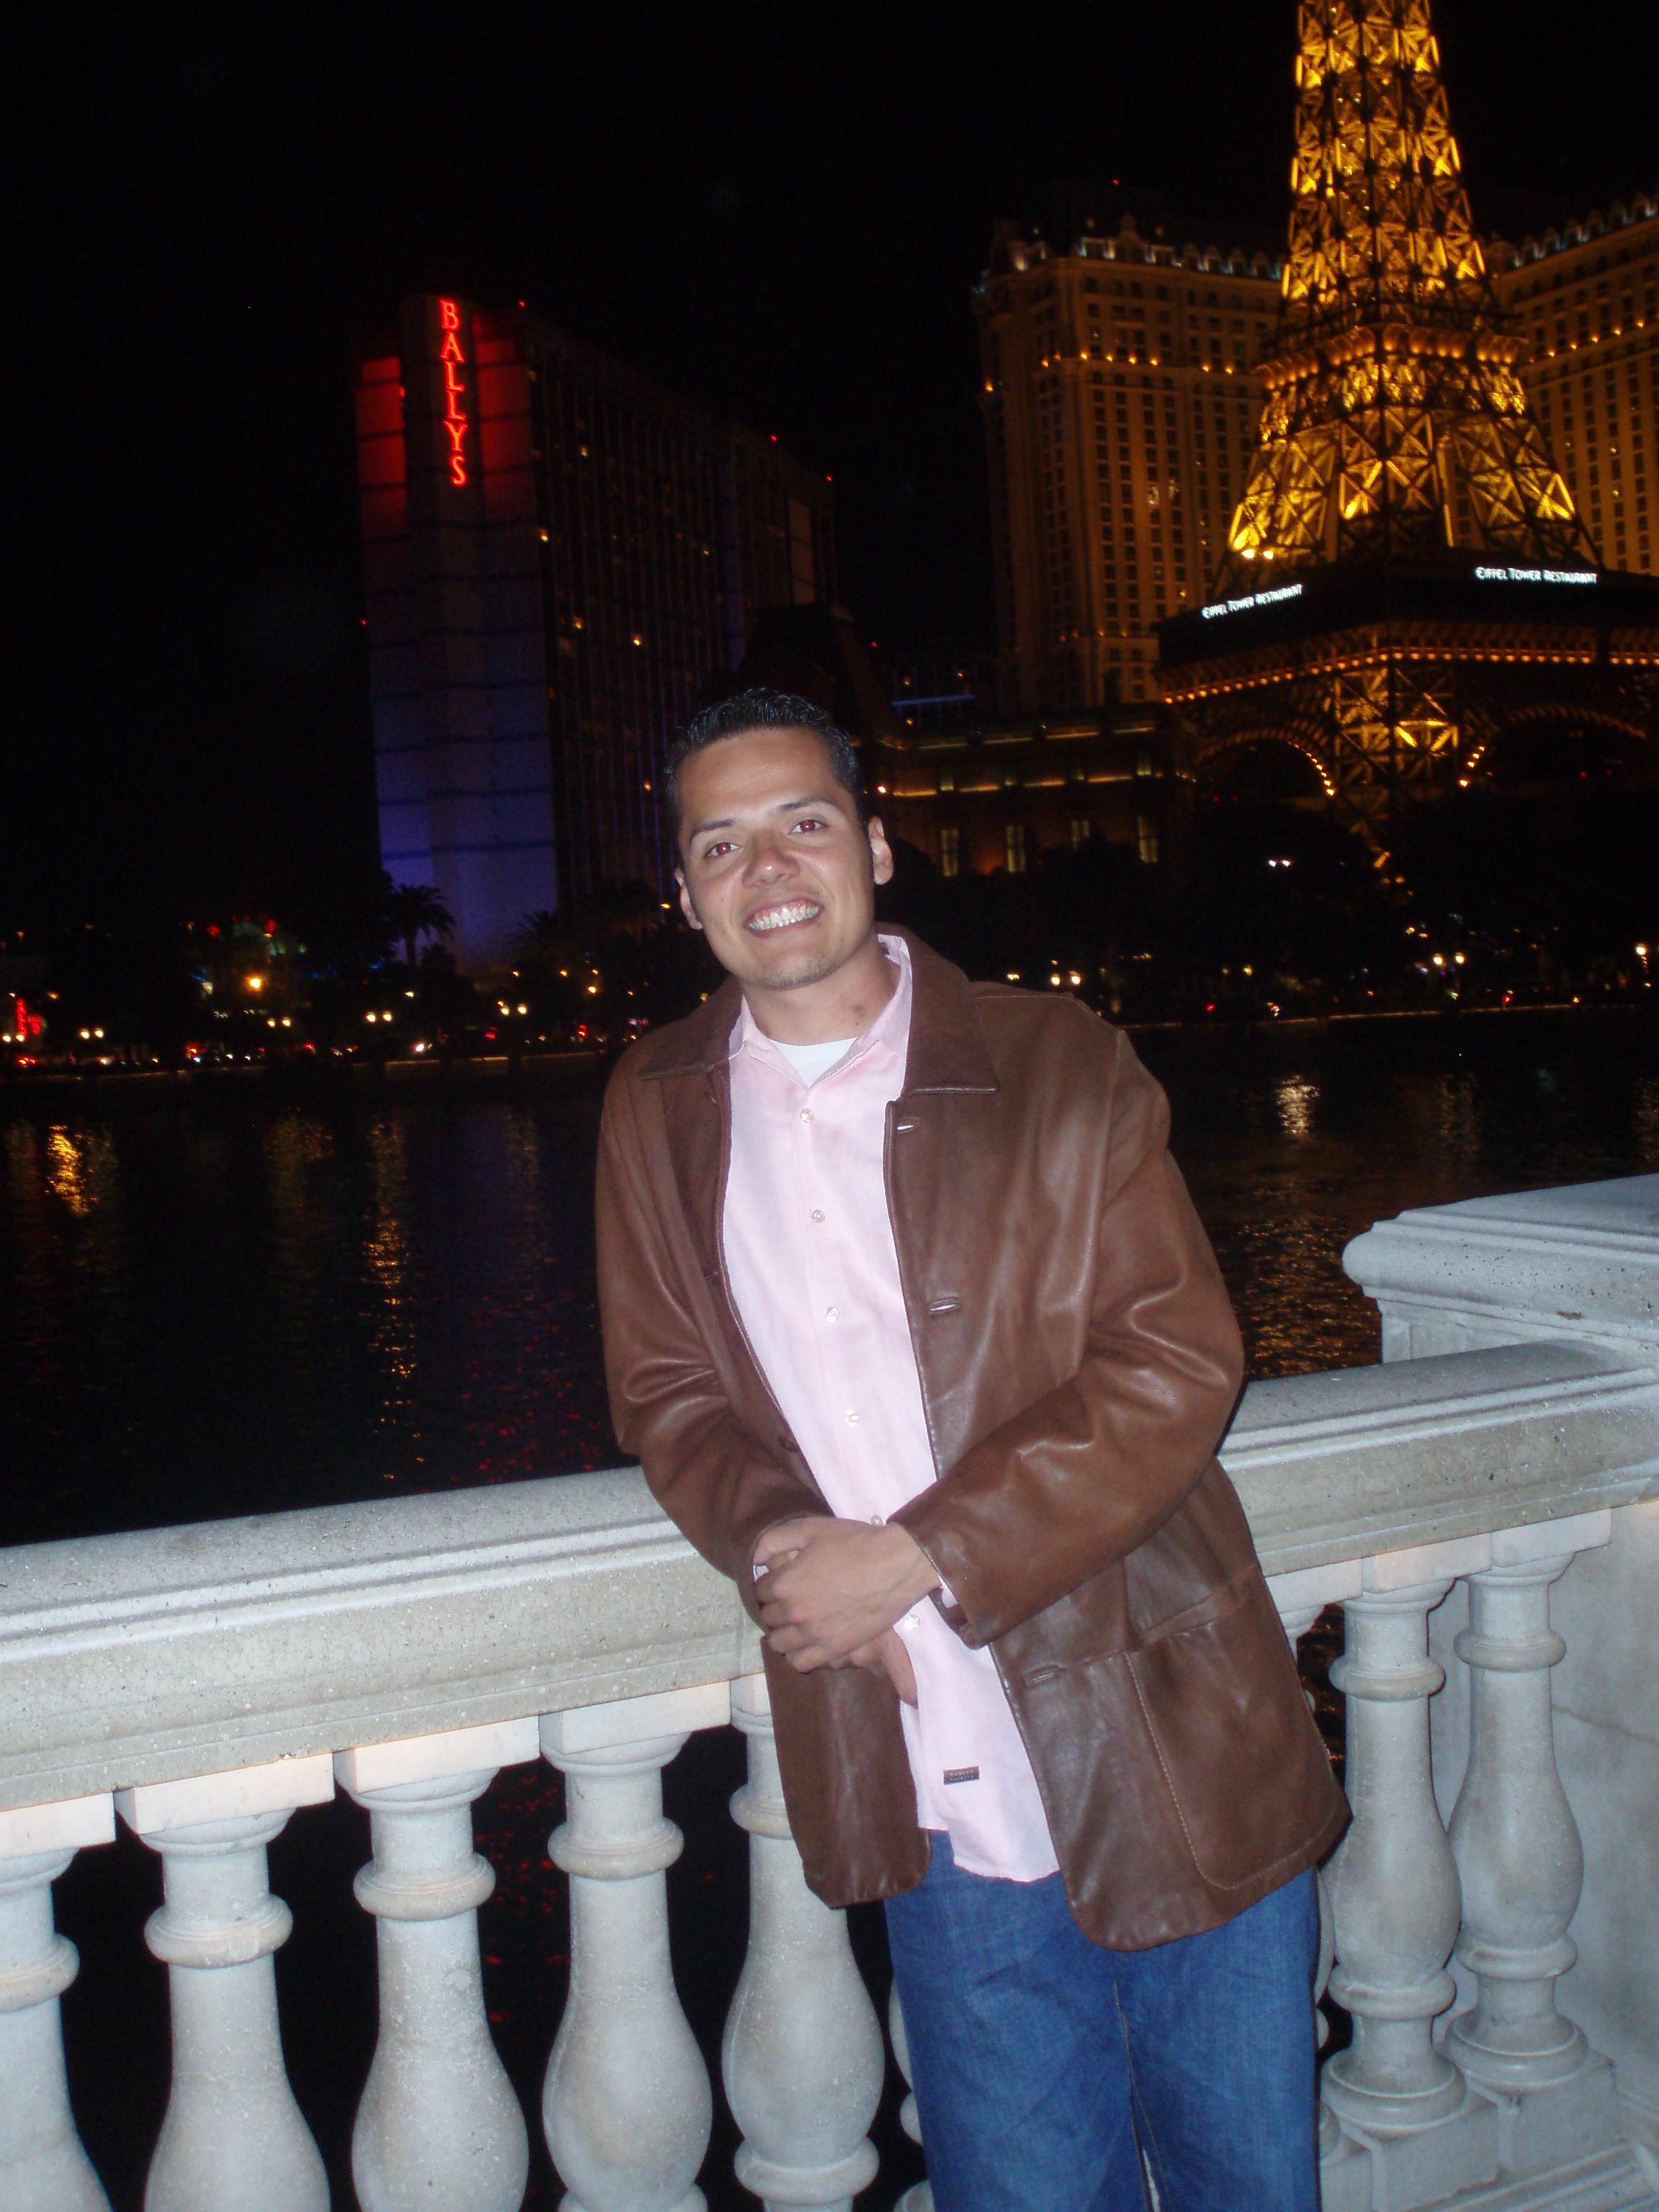 In Las Vegas